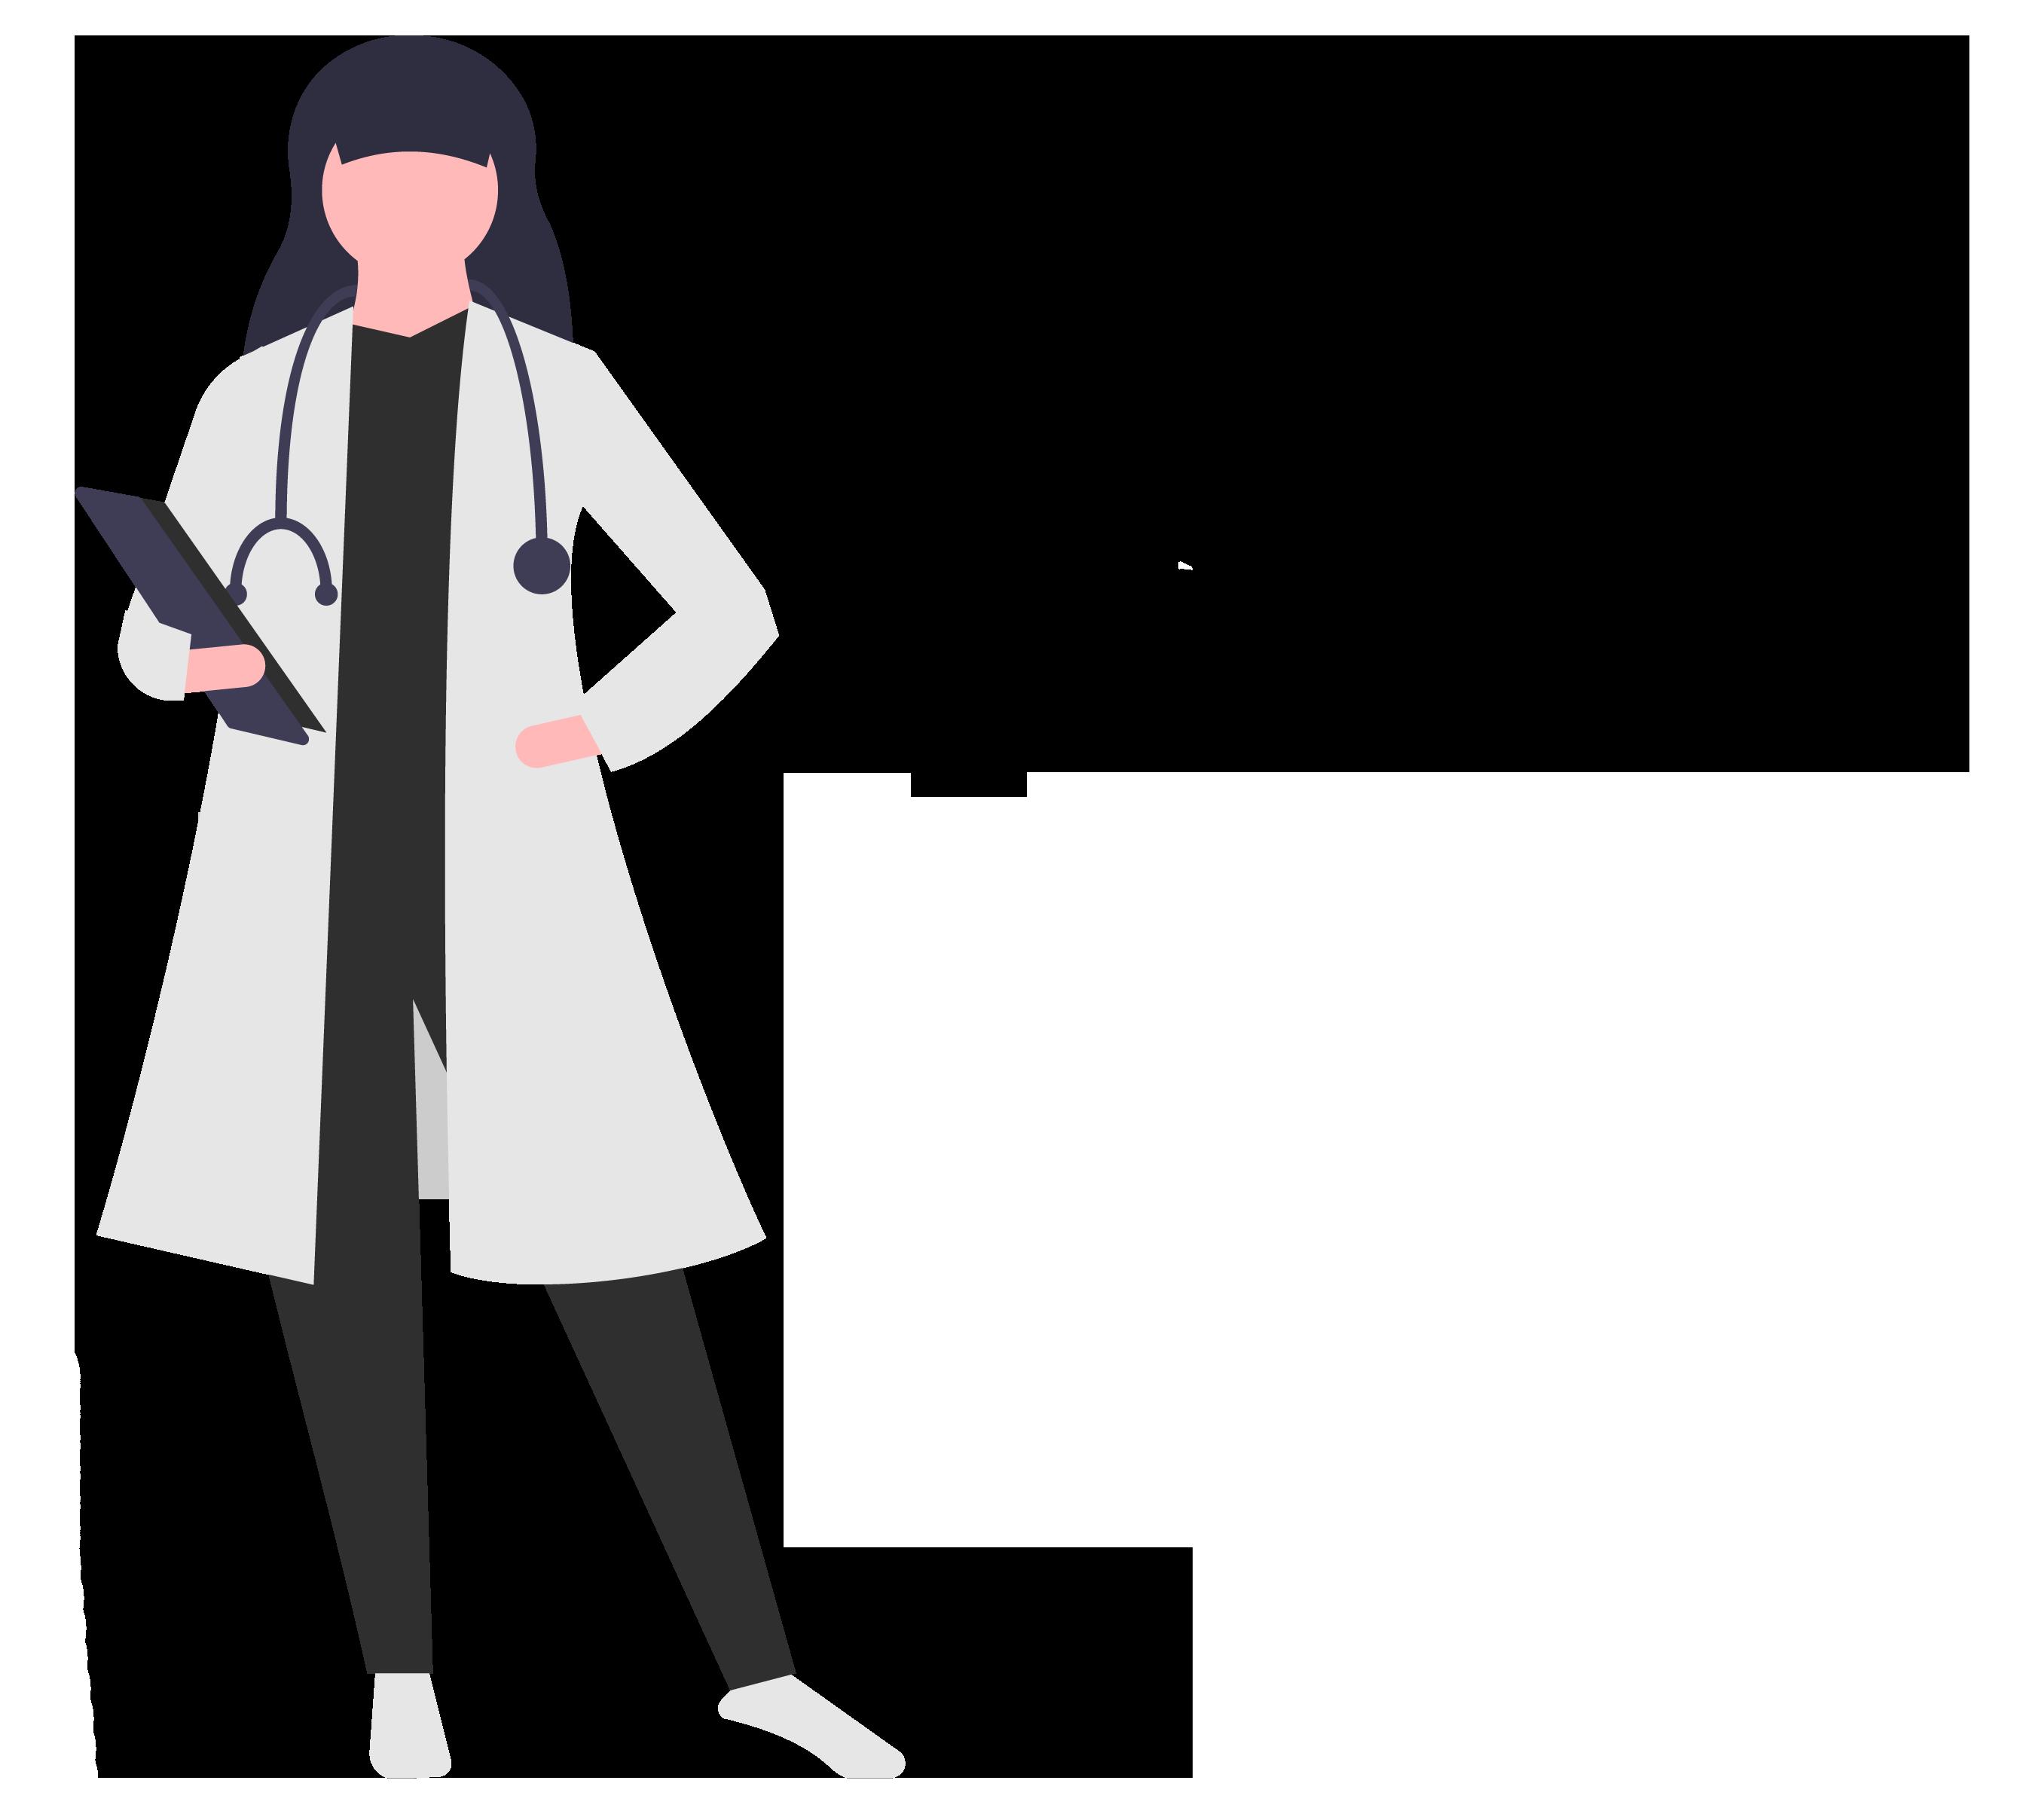 Progesterone illustration 1